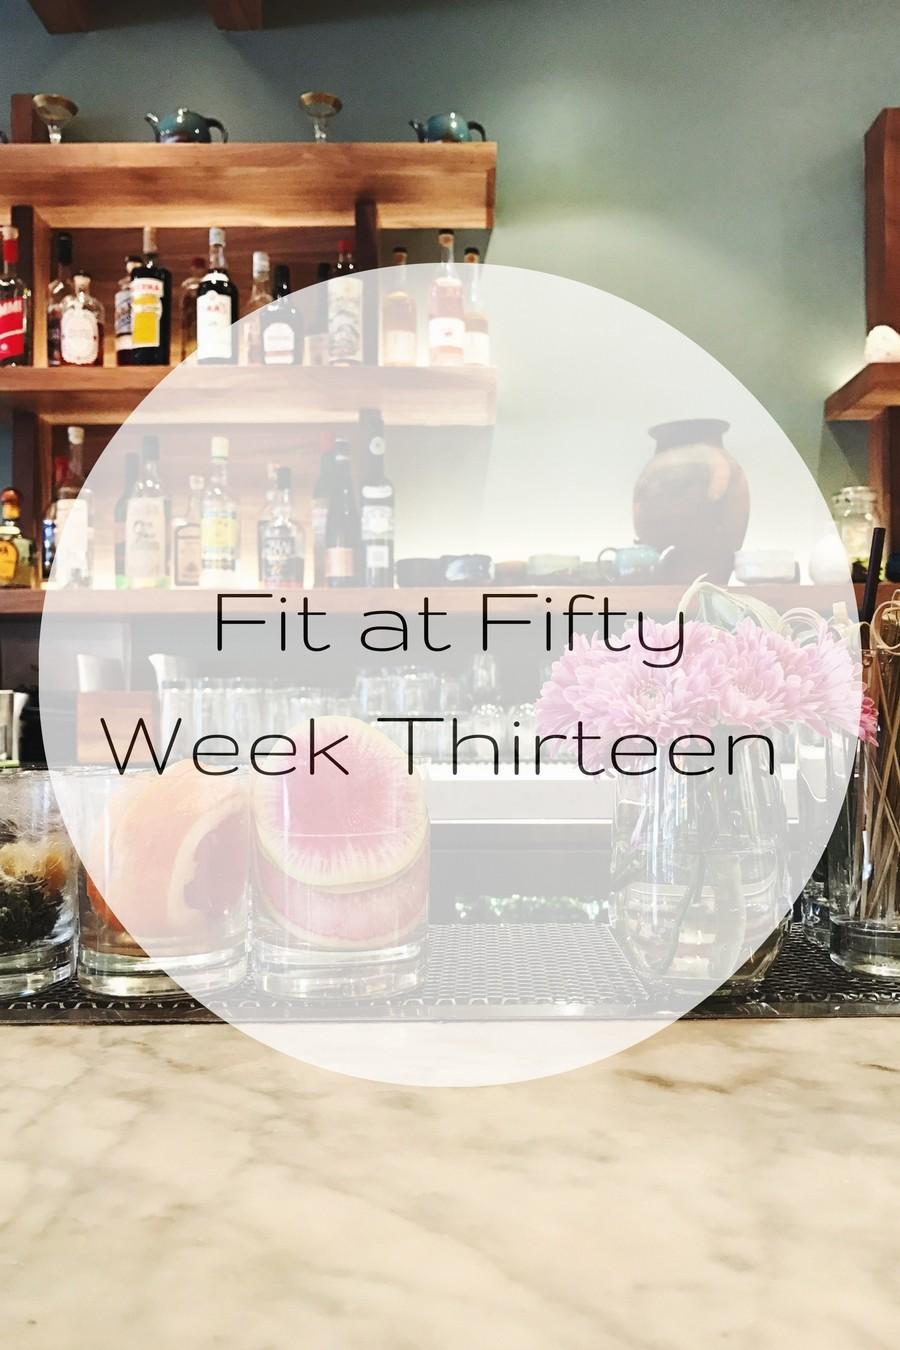 Fit at Fifty Week Thirteen